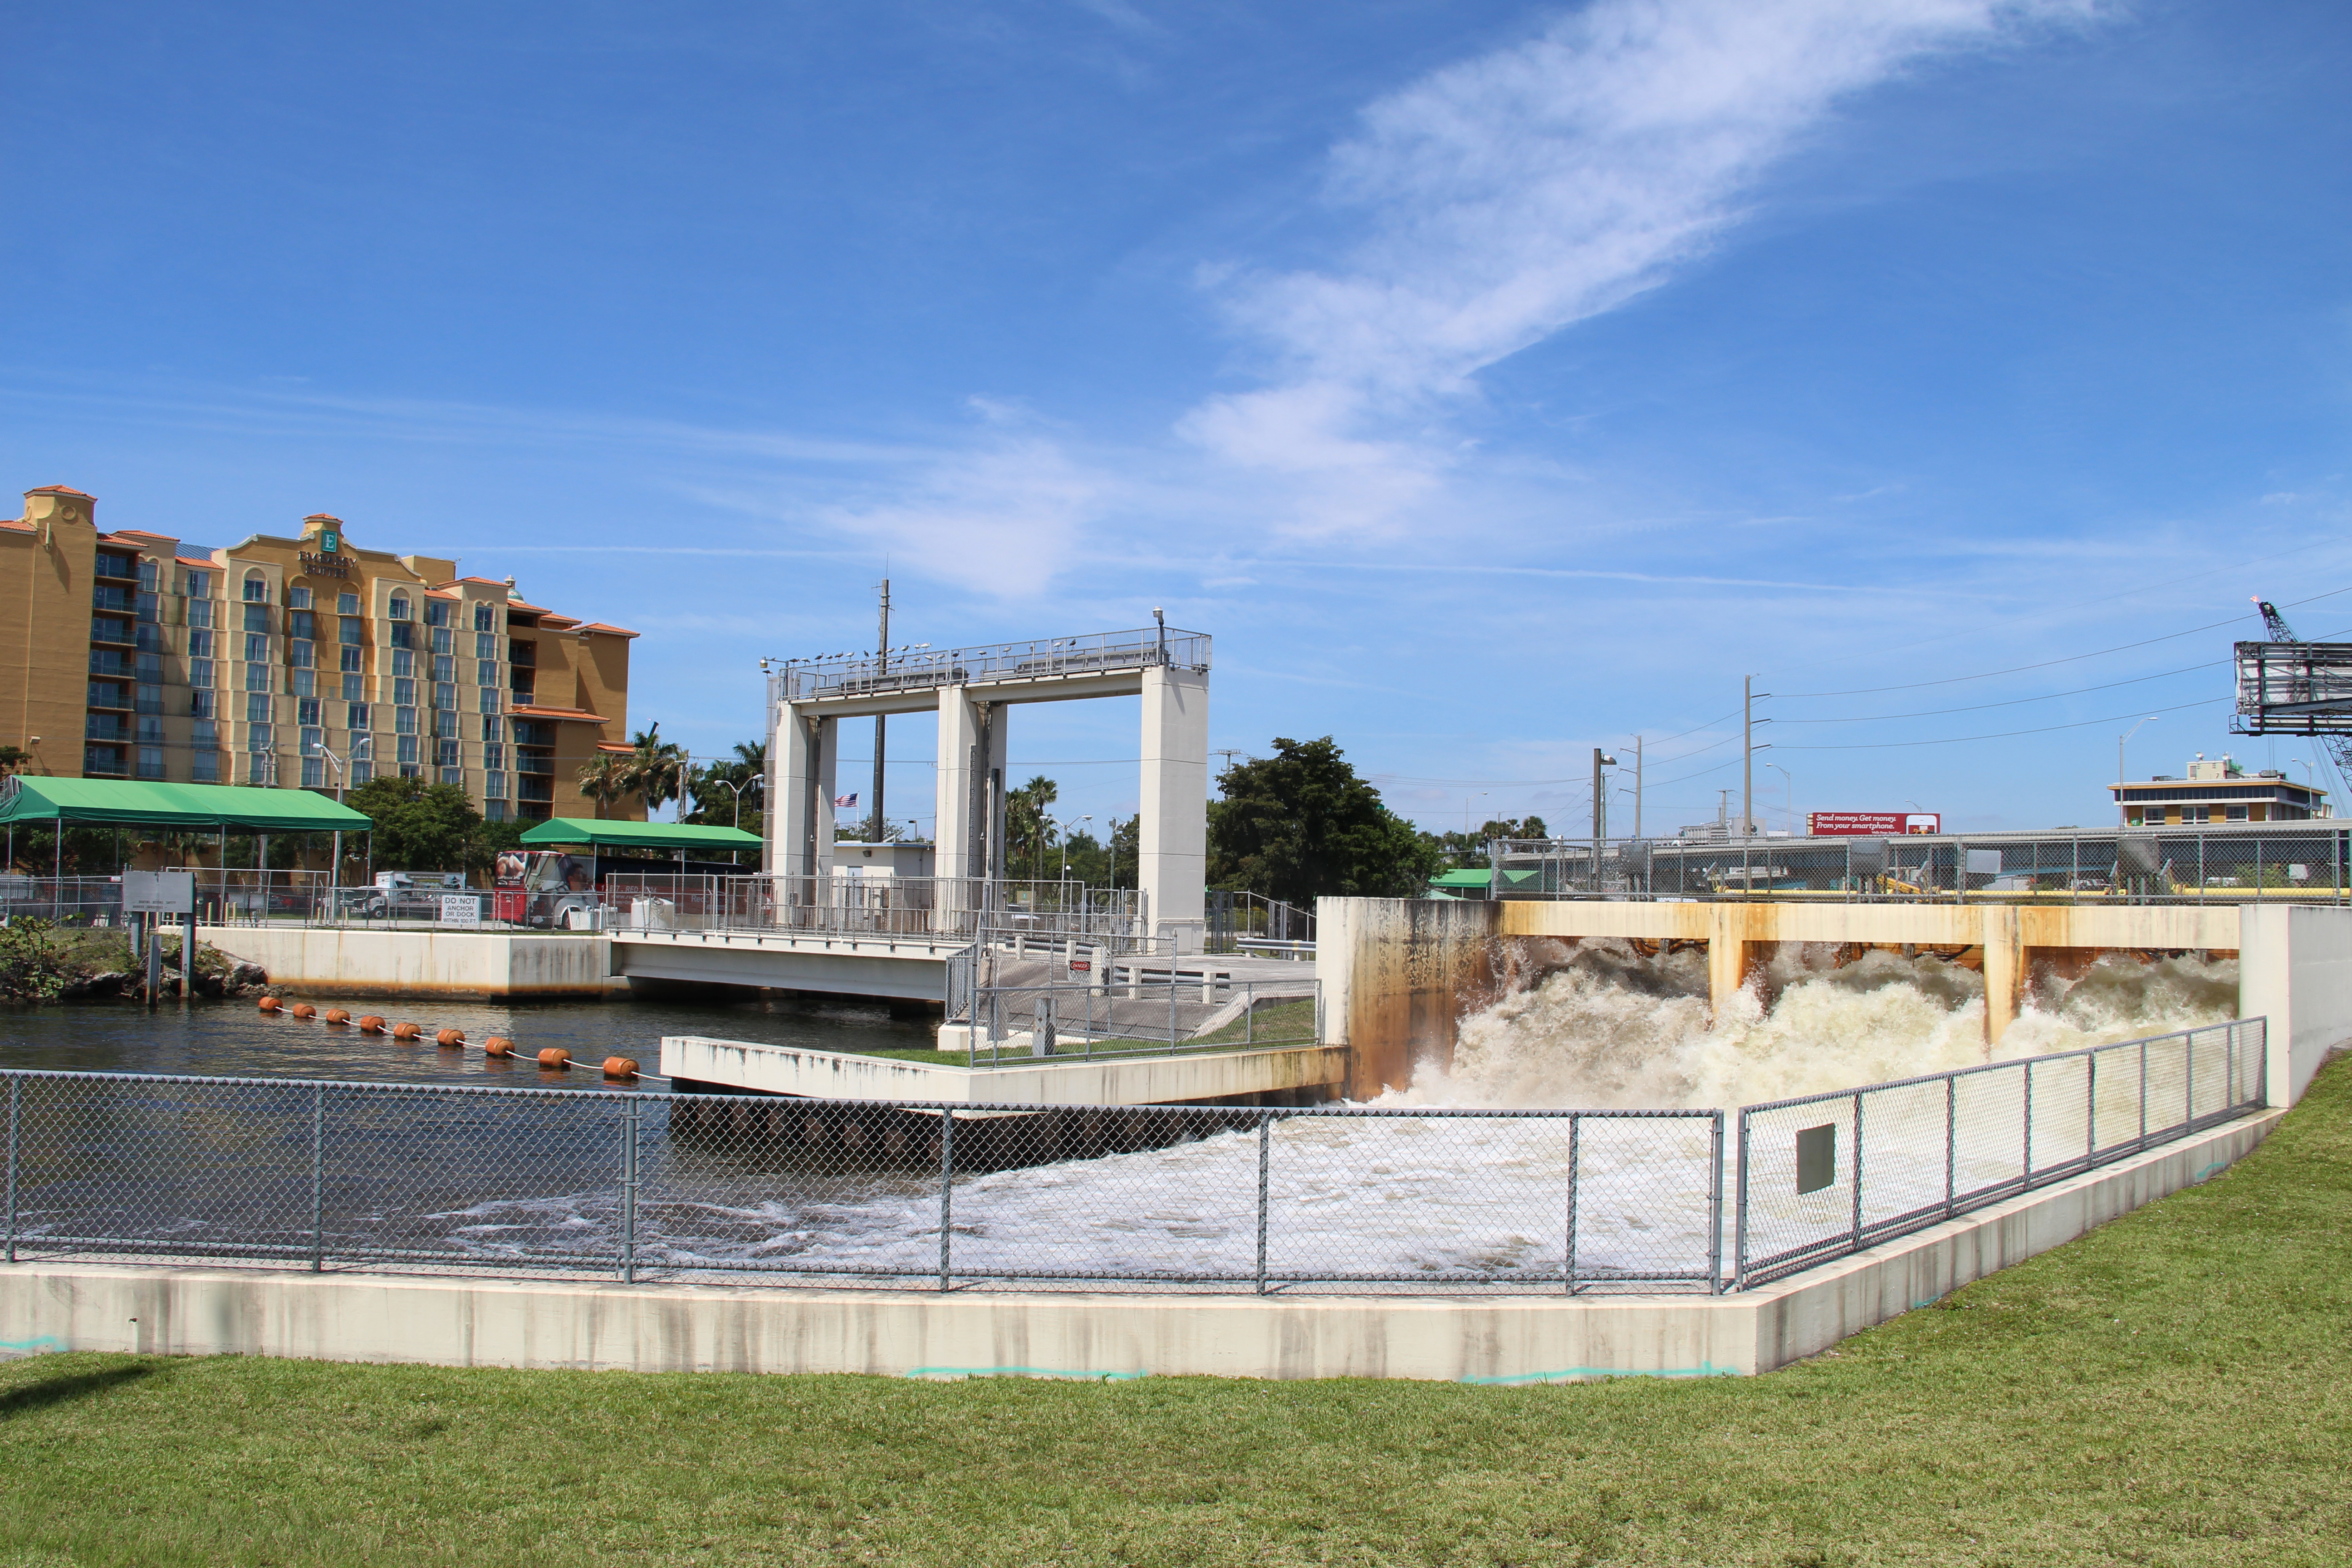 <p>Reverse pumps churn water toward the ocean; Miami, FL. Photo credit: Rhys Gerholdt/WRI</p>